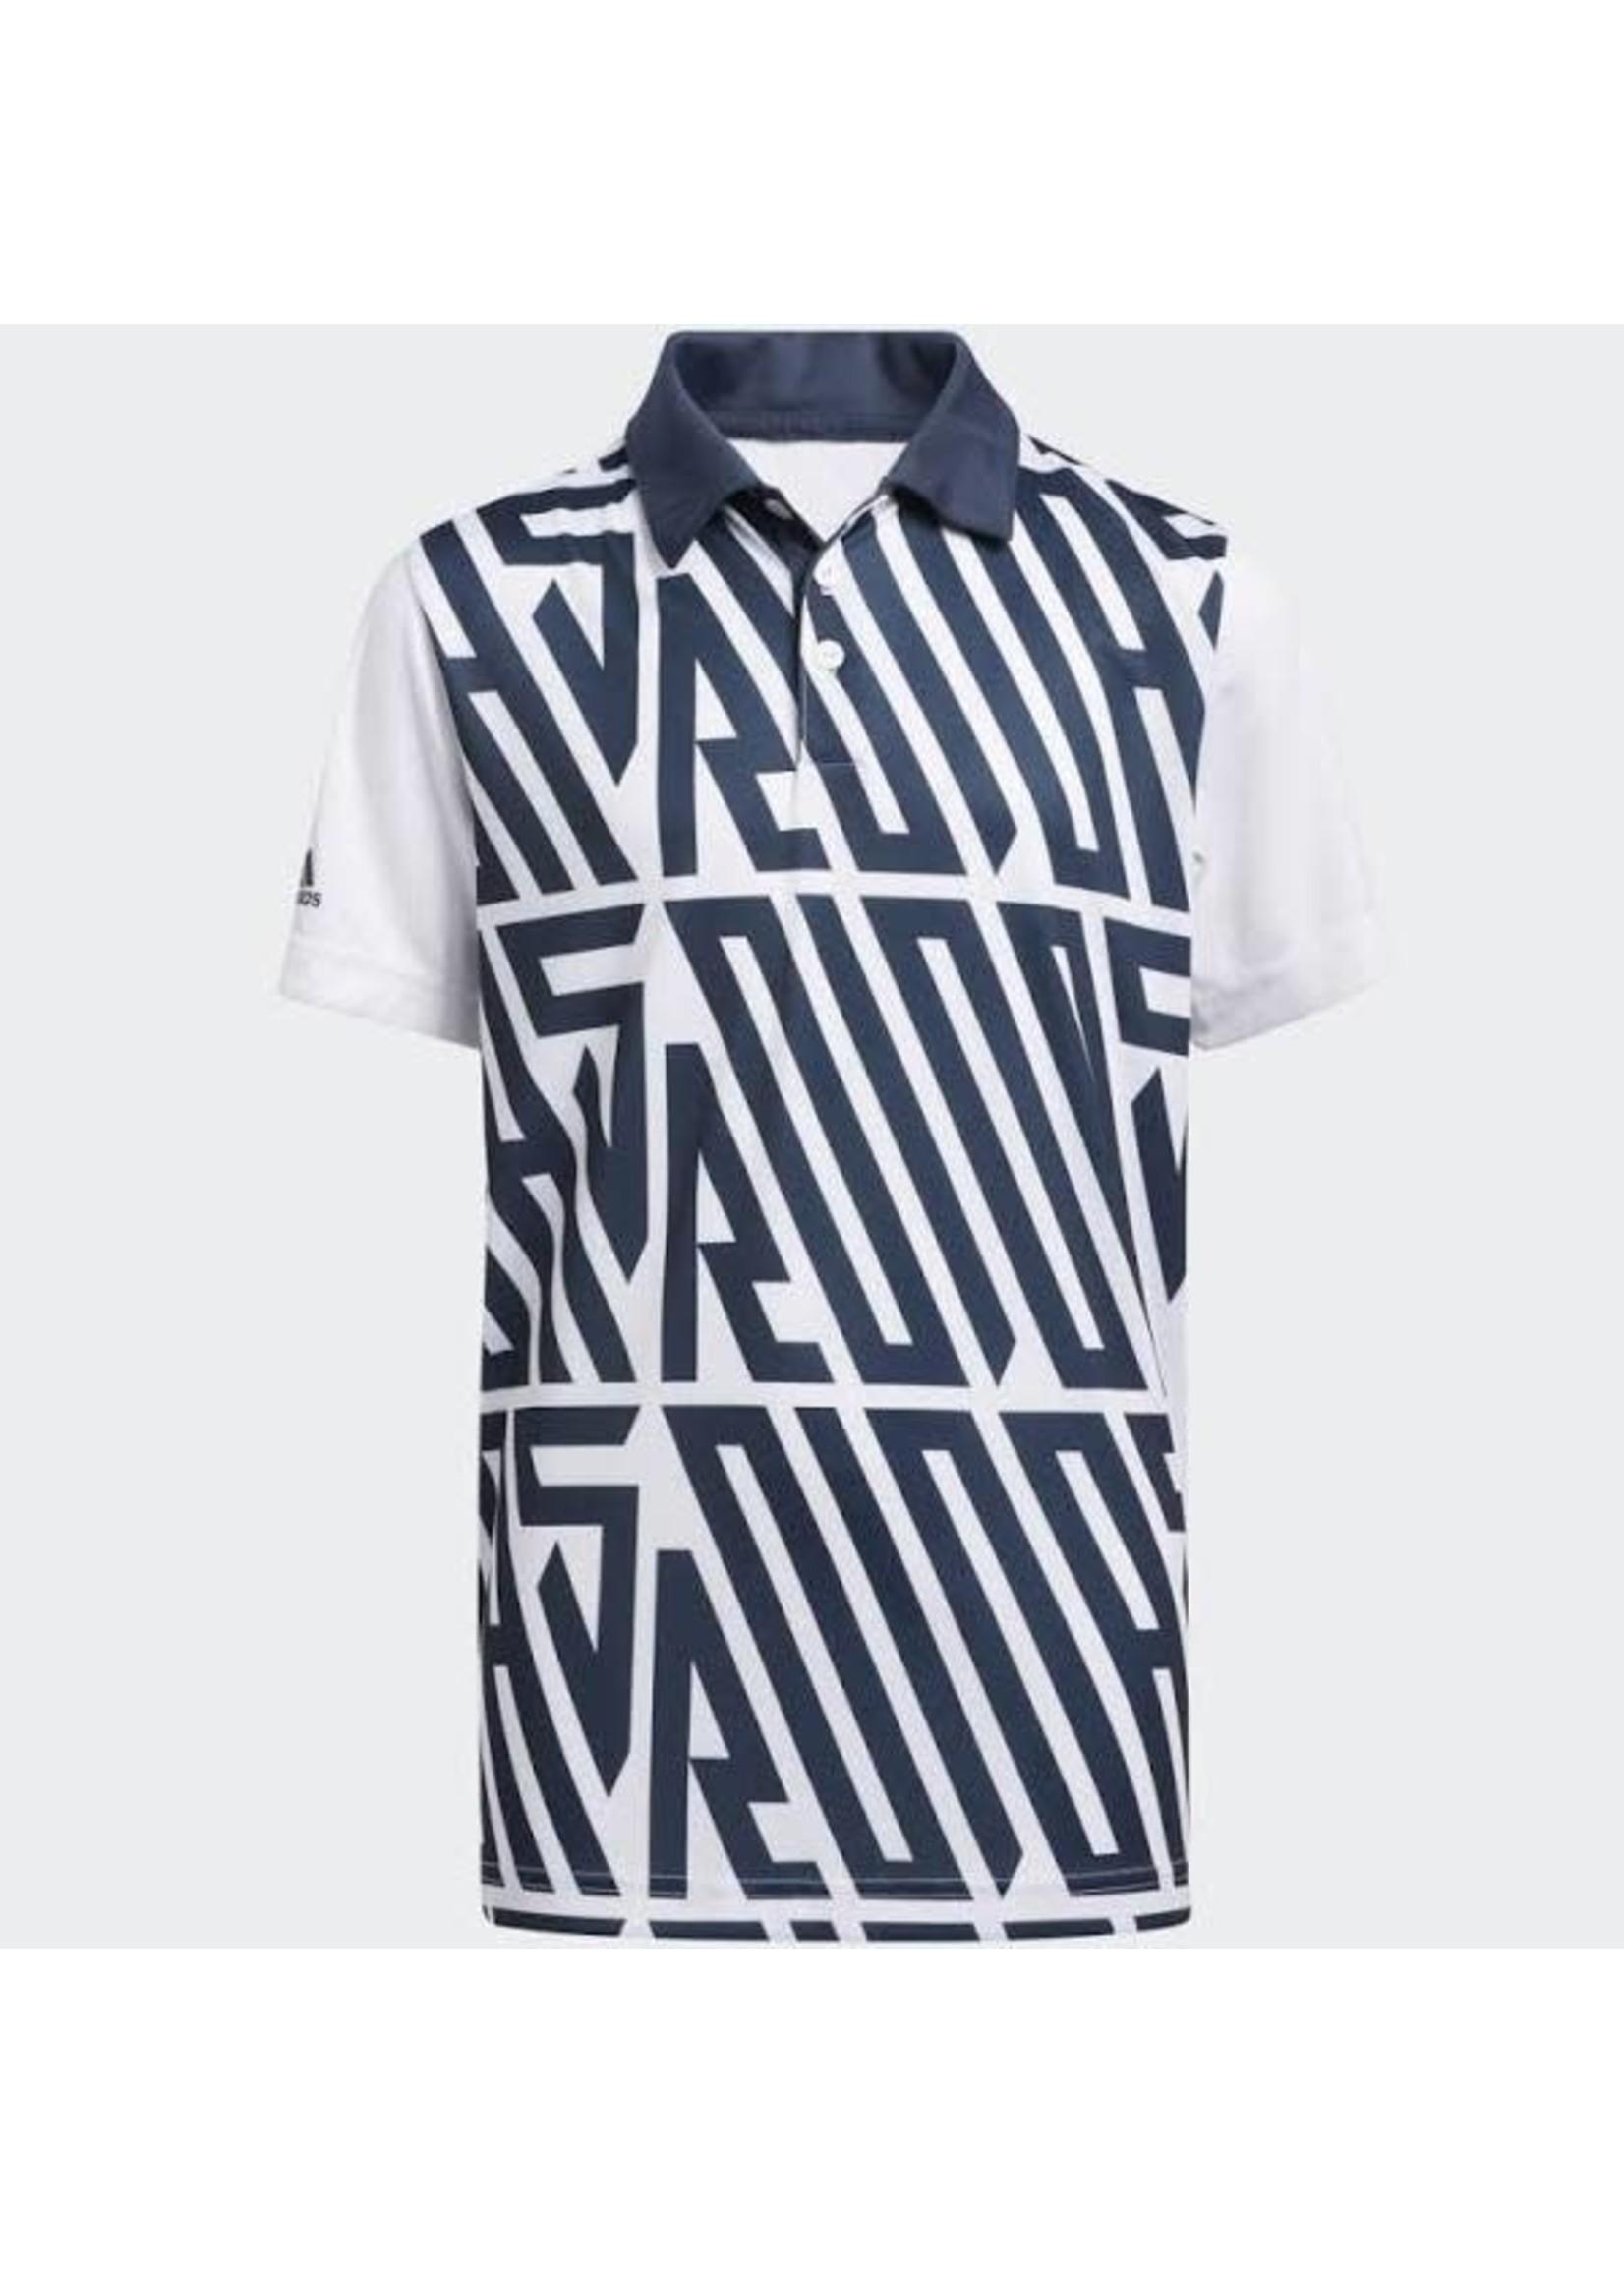 Adidas Adidas Junior Printed Golf Polo Shirt, Navy/White (2021)